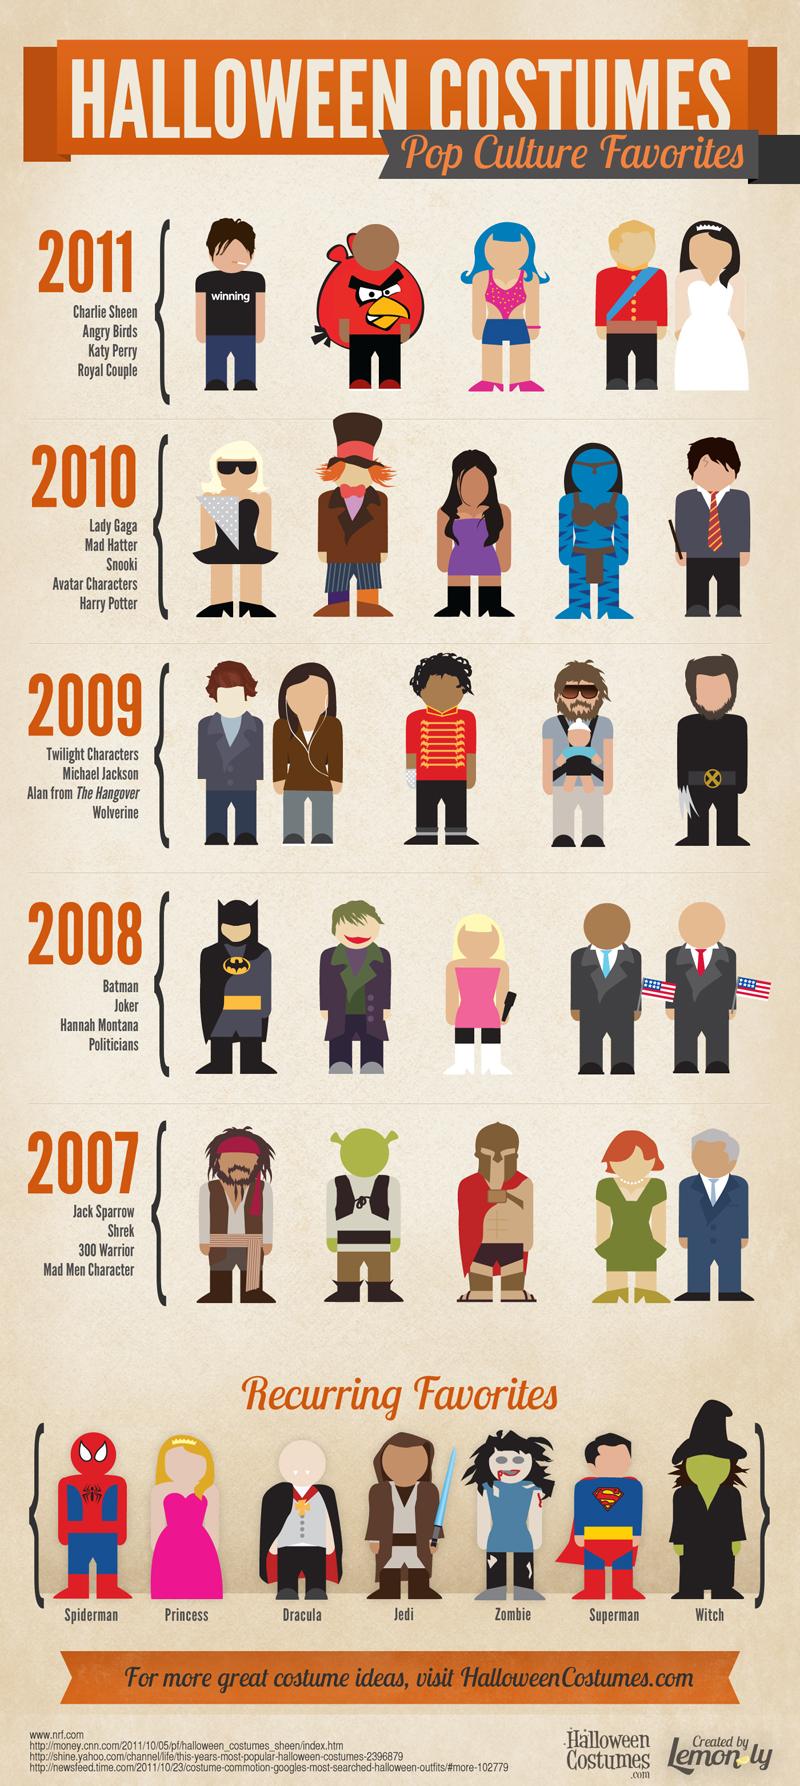 Pop Culture Halloween Costume Favorites